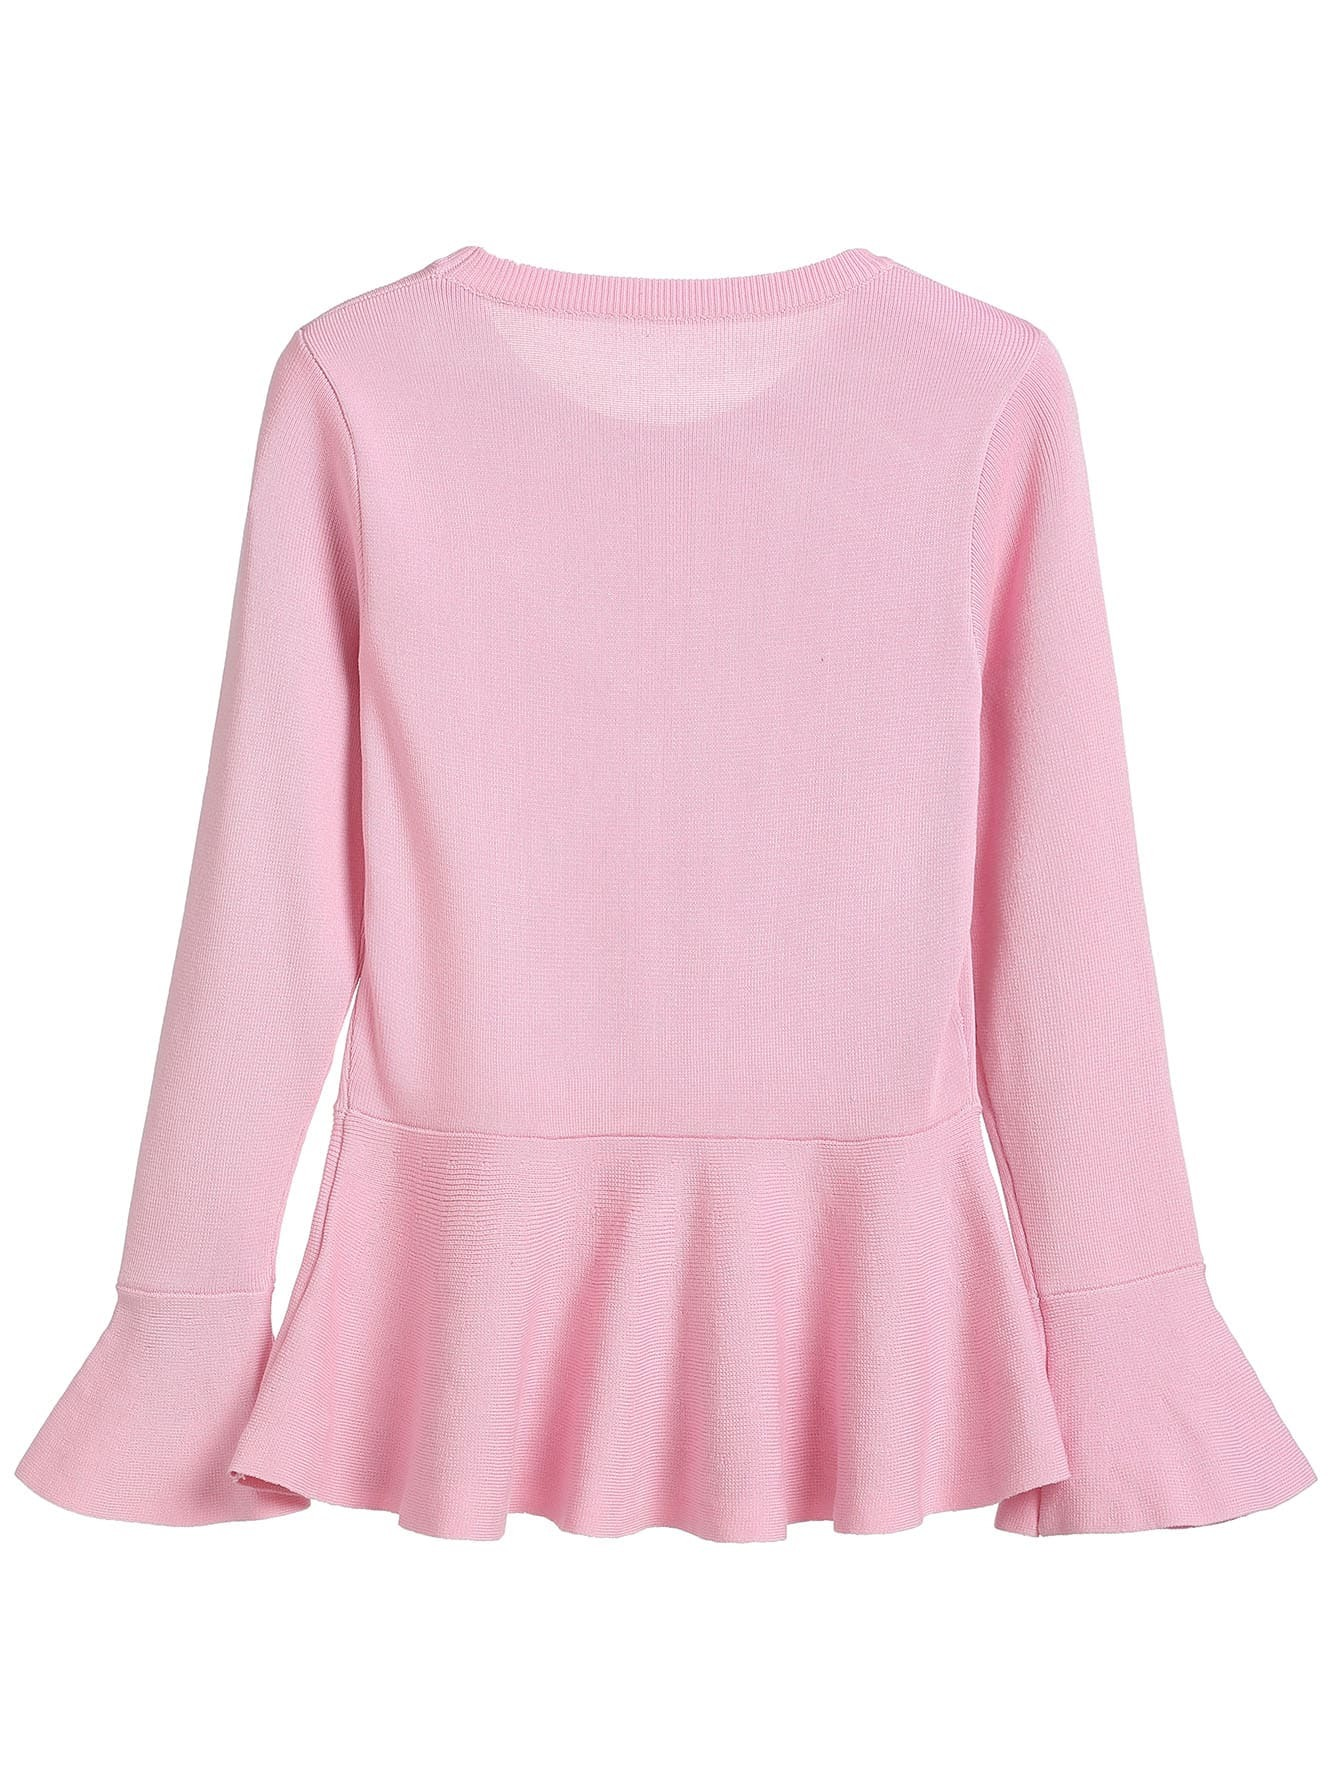 sweater160829121_2